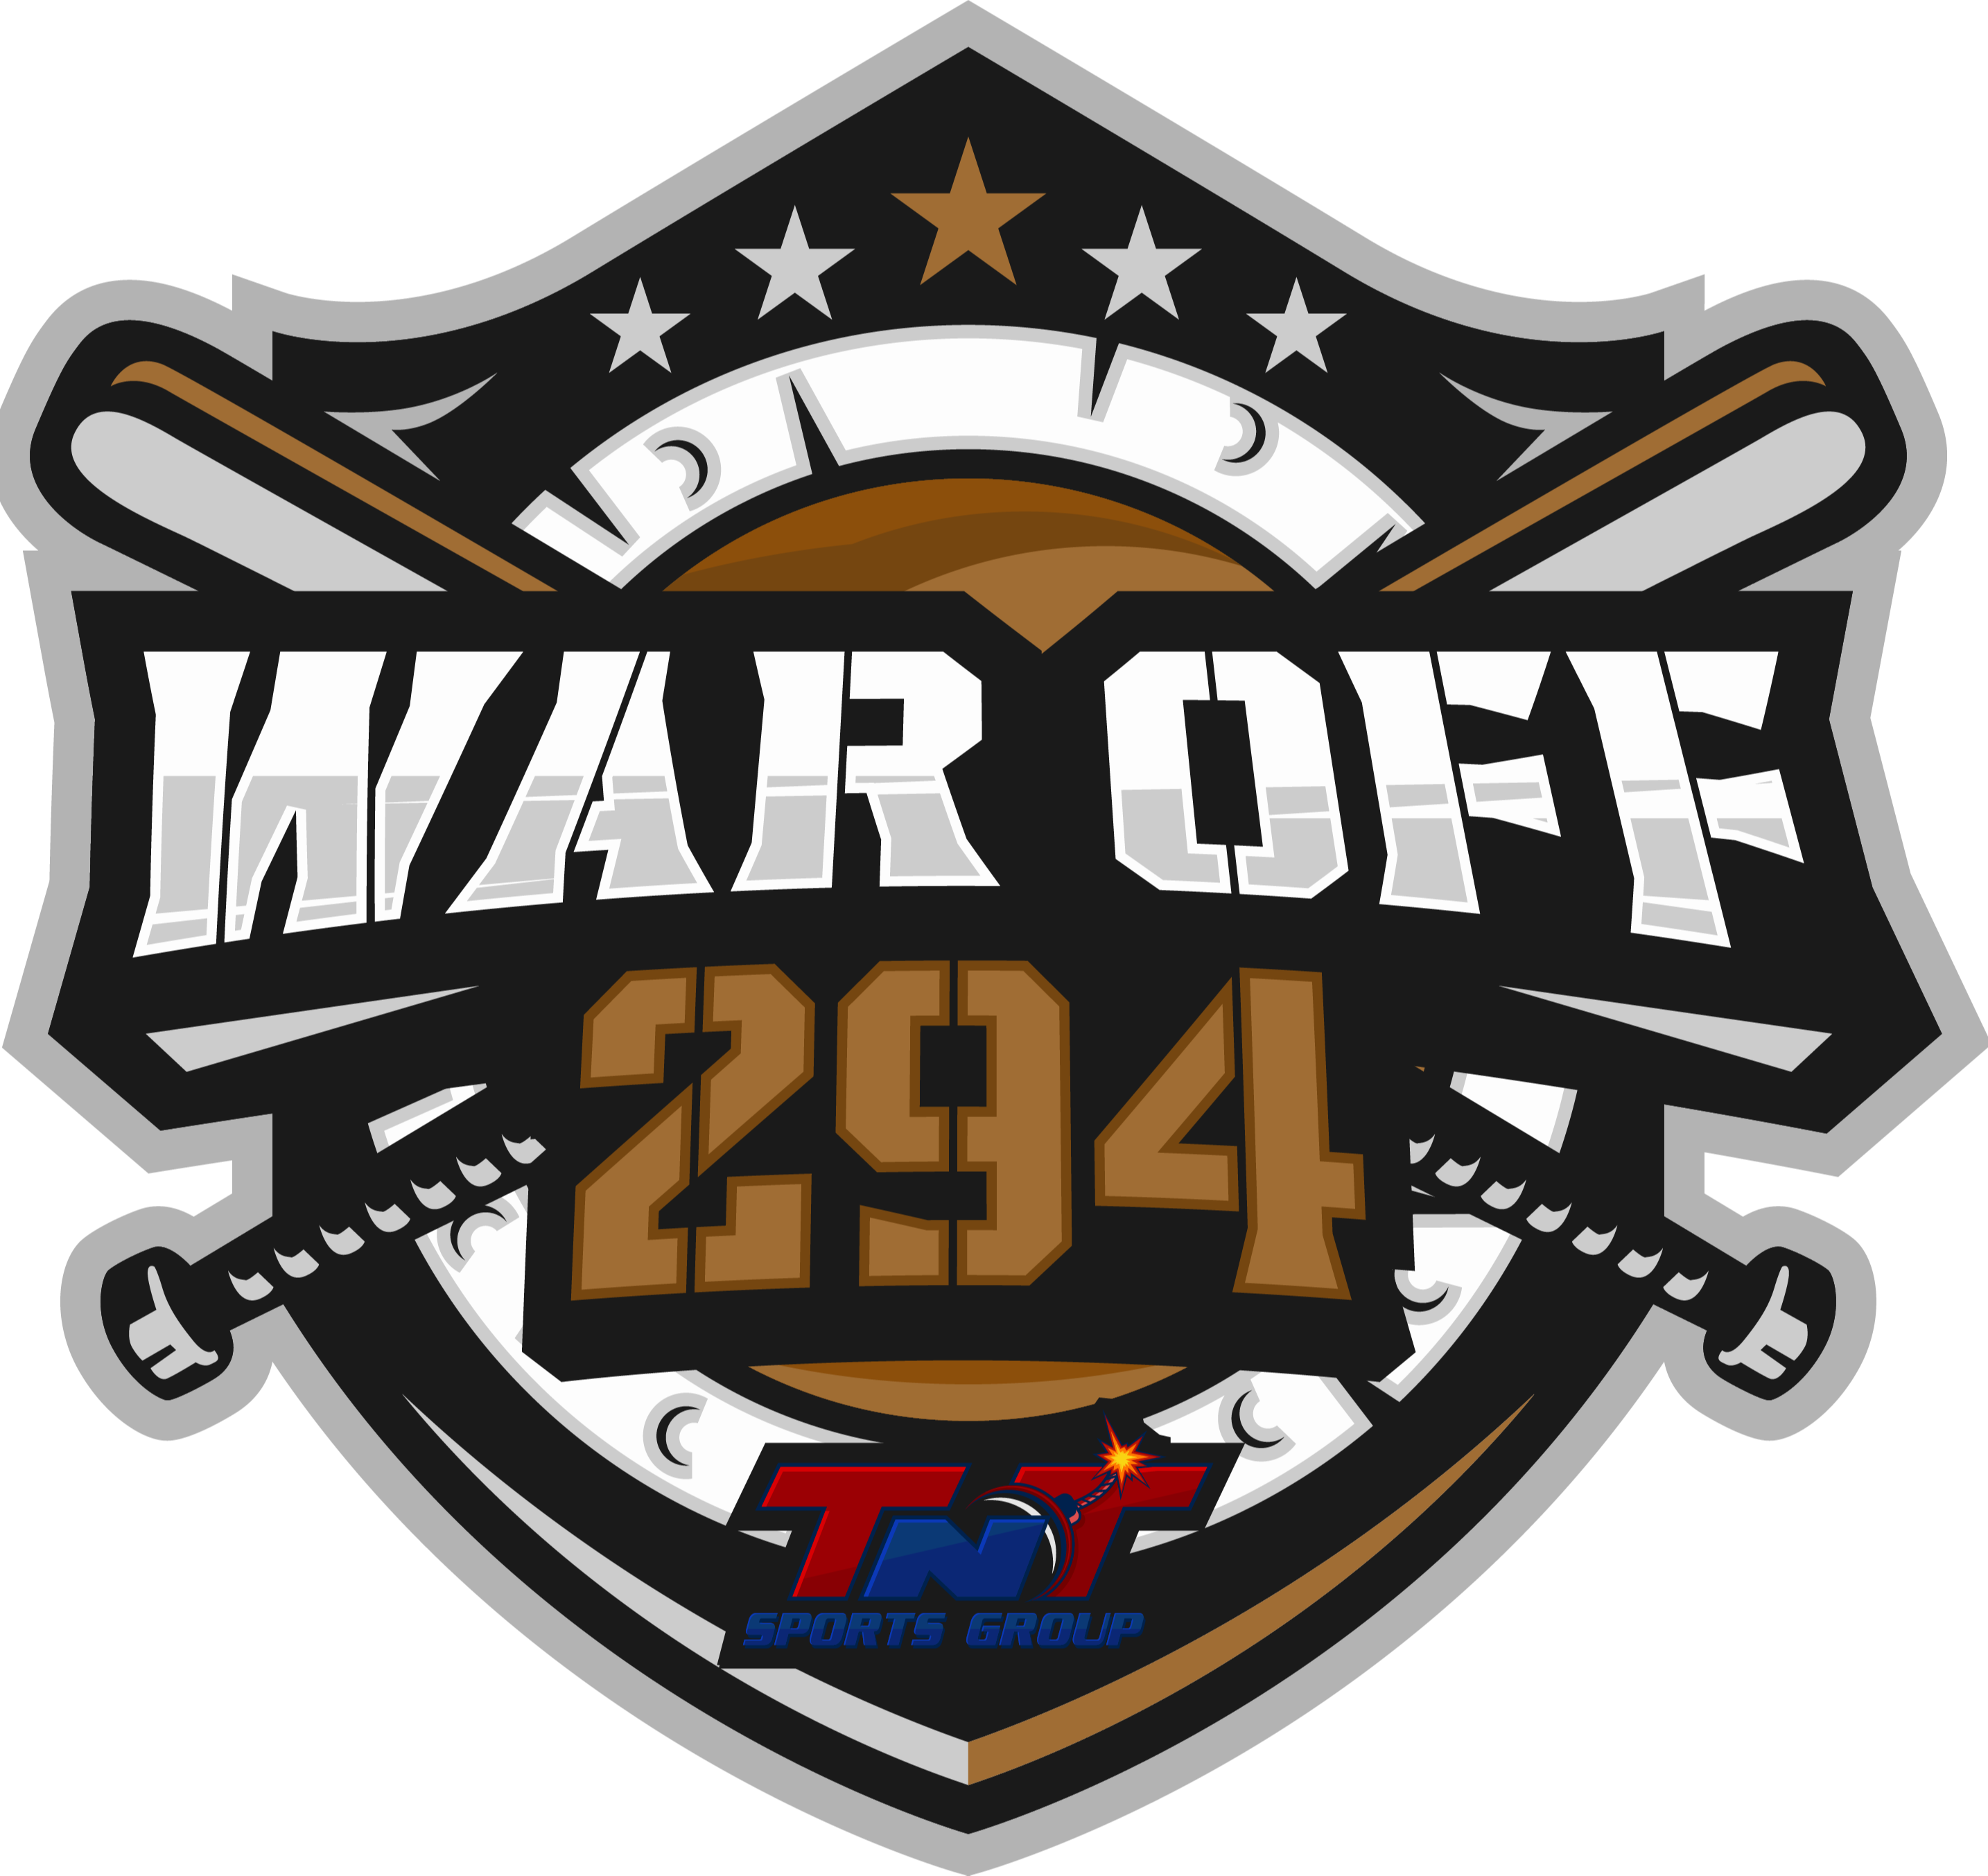 TNT SG War off 294 Even Ages